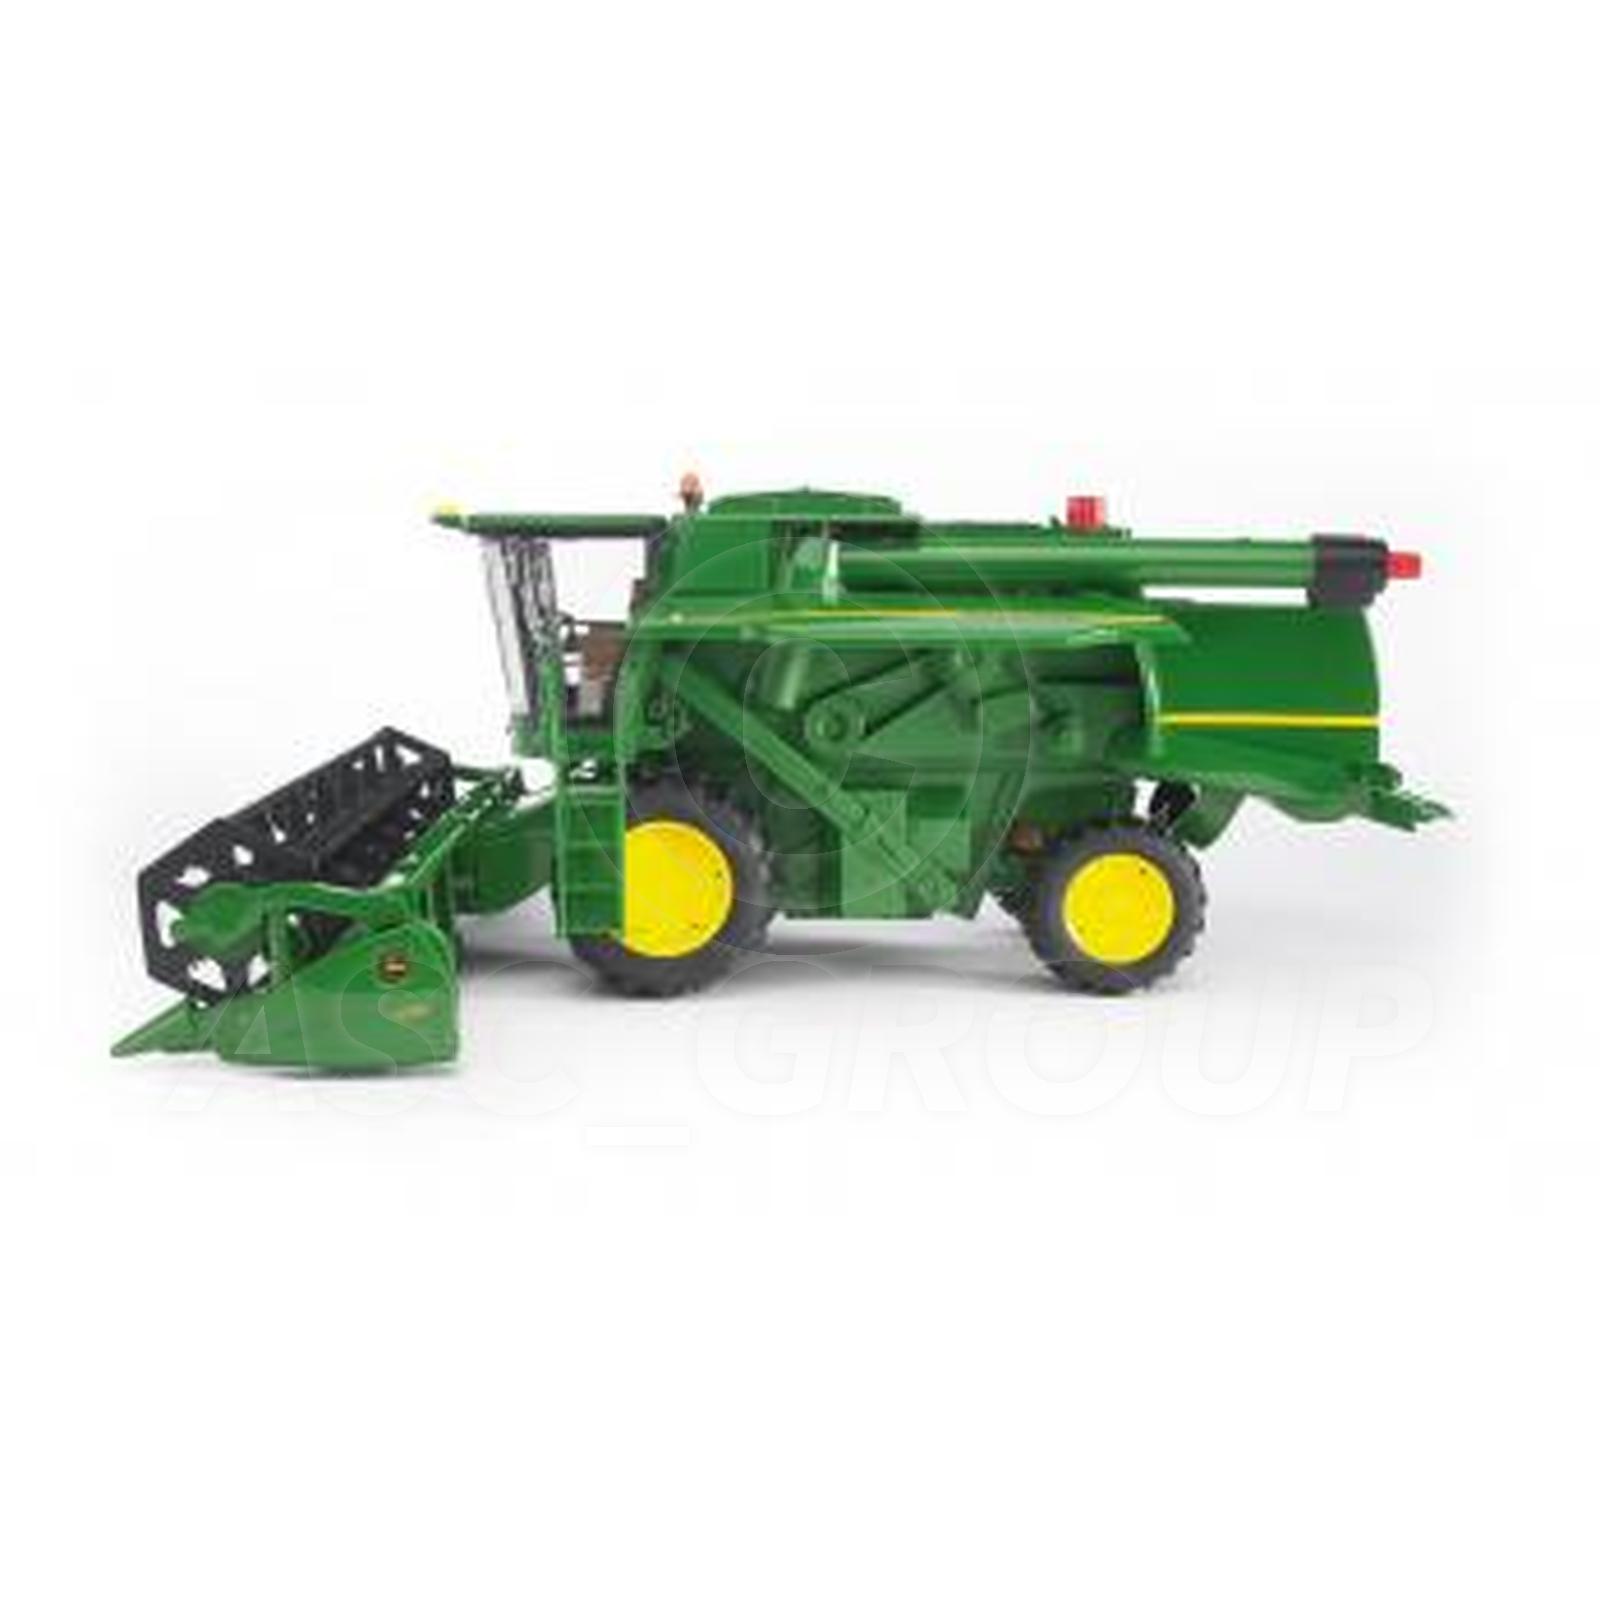 Bruder Toys 02132 Pro Series John Deere Combine Harvester T670i - 1:16 ...